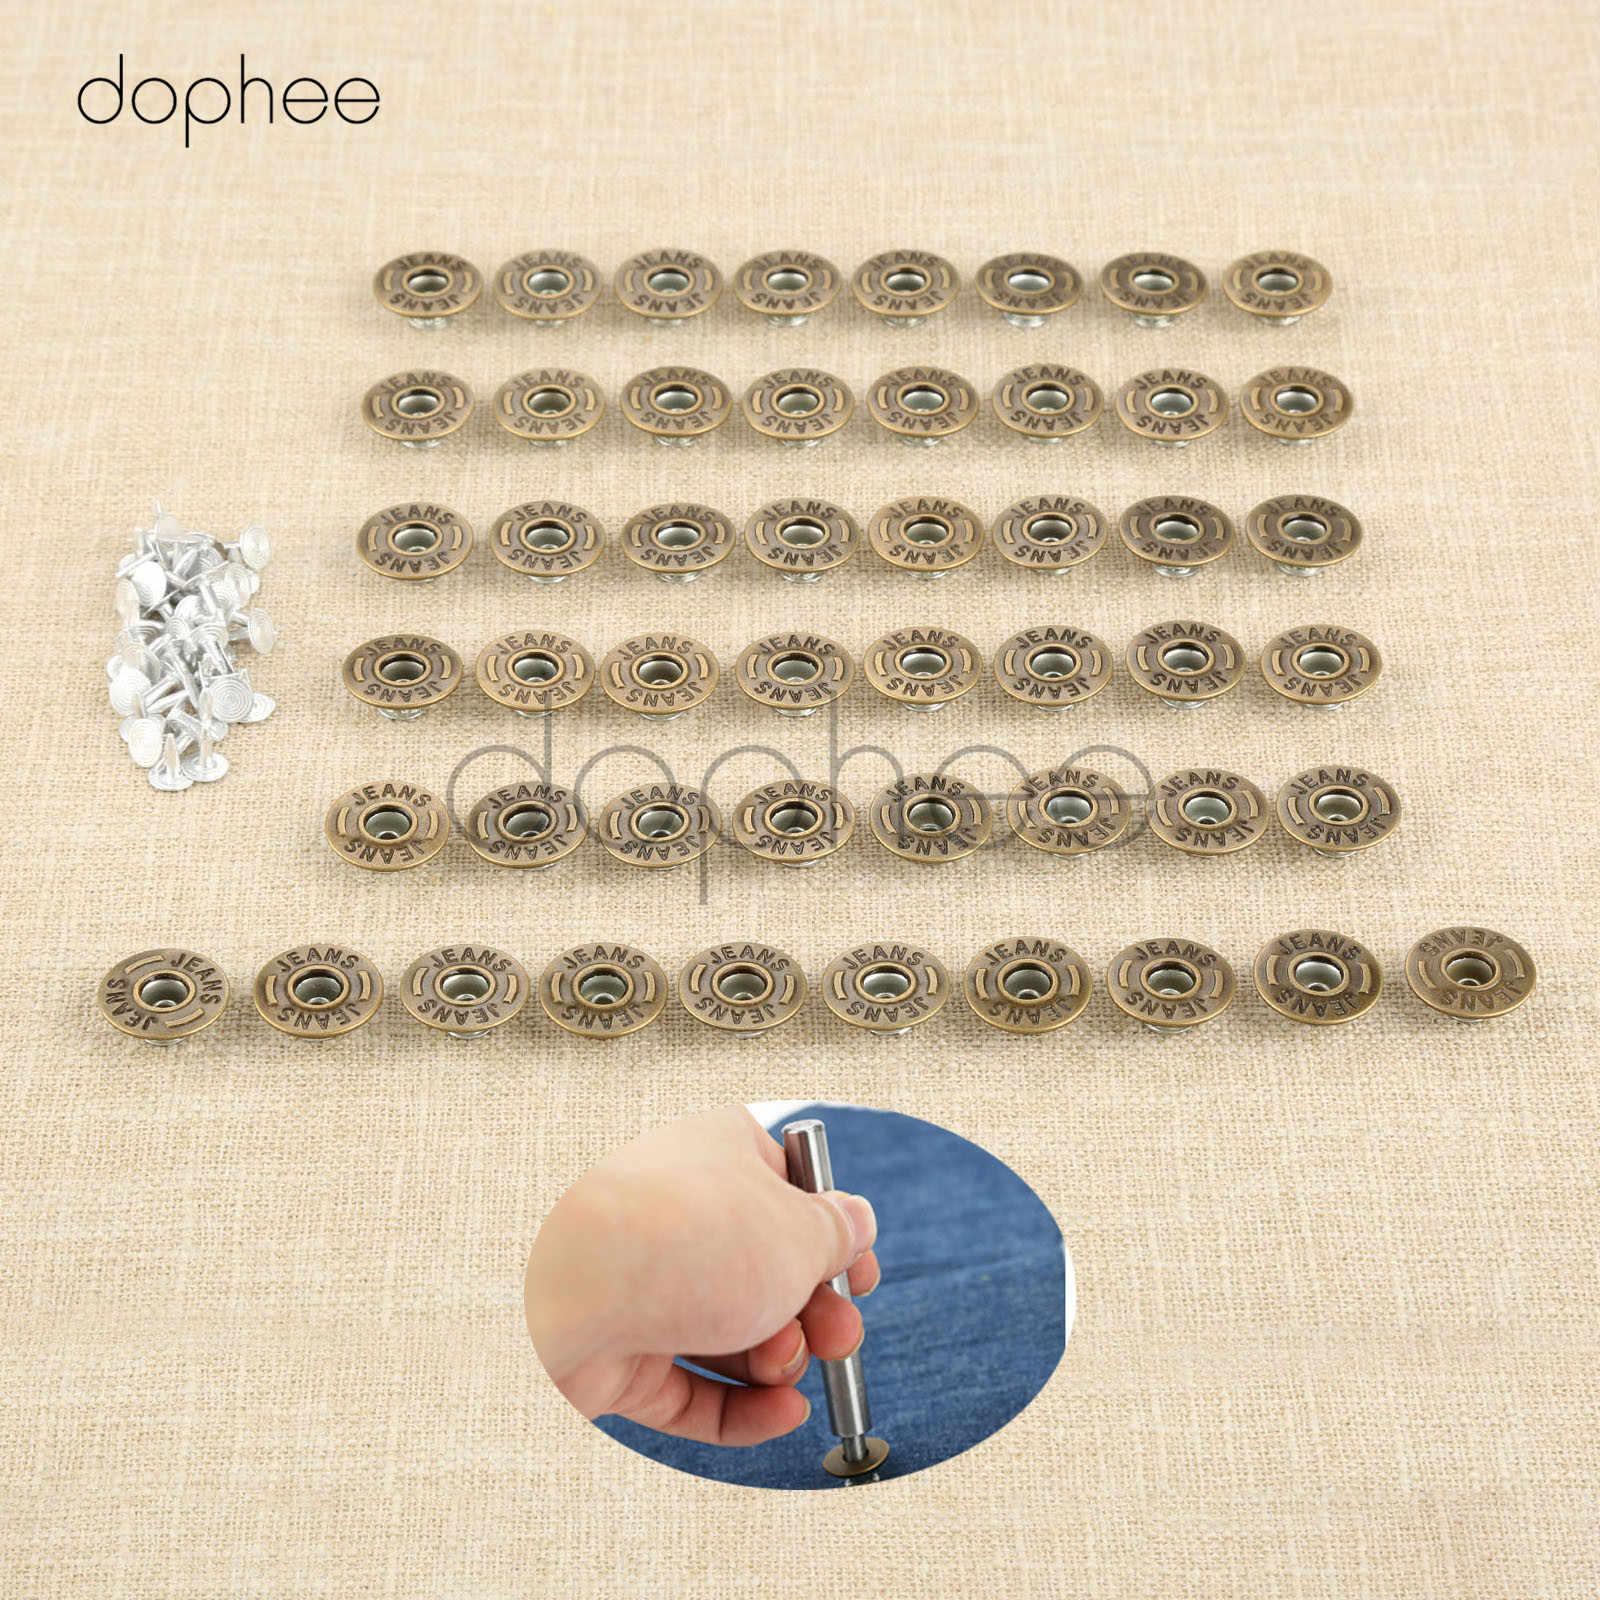 50Pcs Bronce Antiguo Metal Ropa Jeans Tachuela Botones Snap patrón aleatorio 20mm